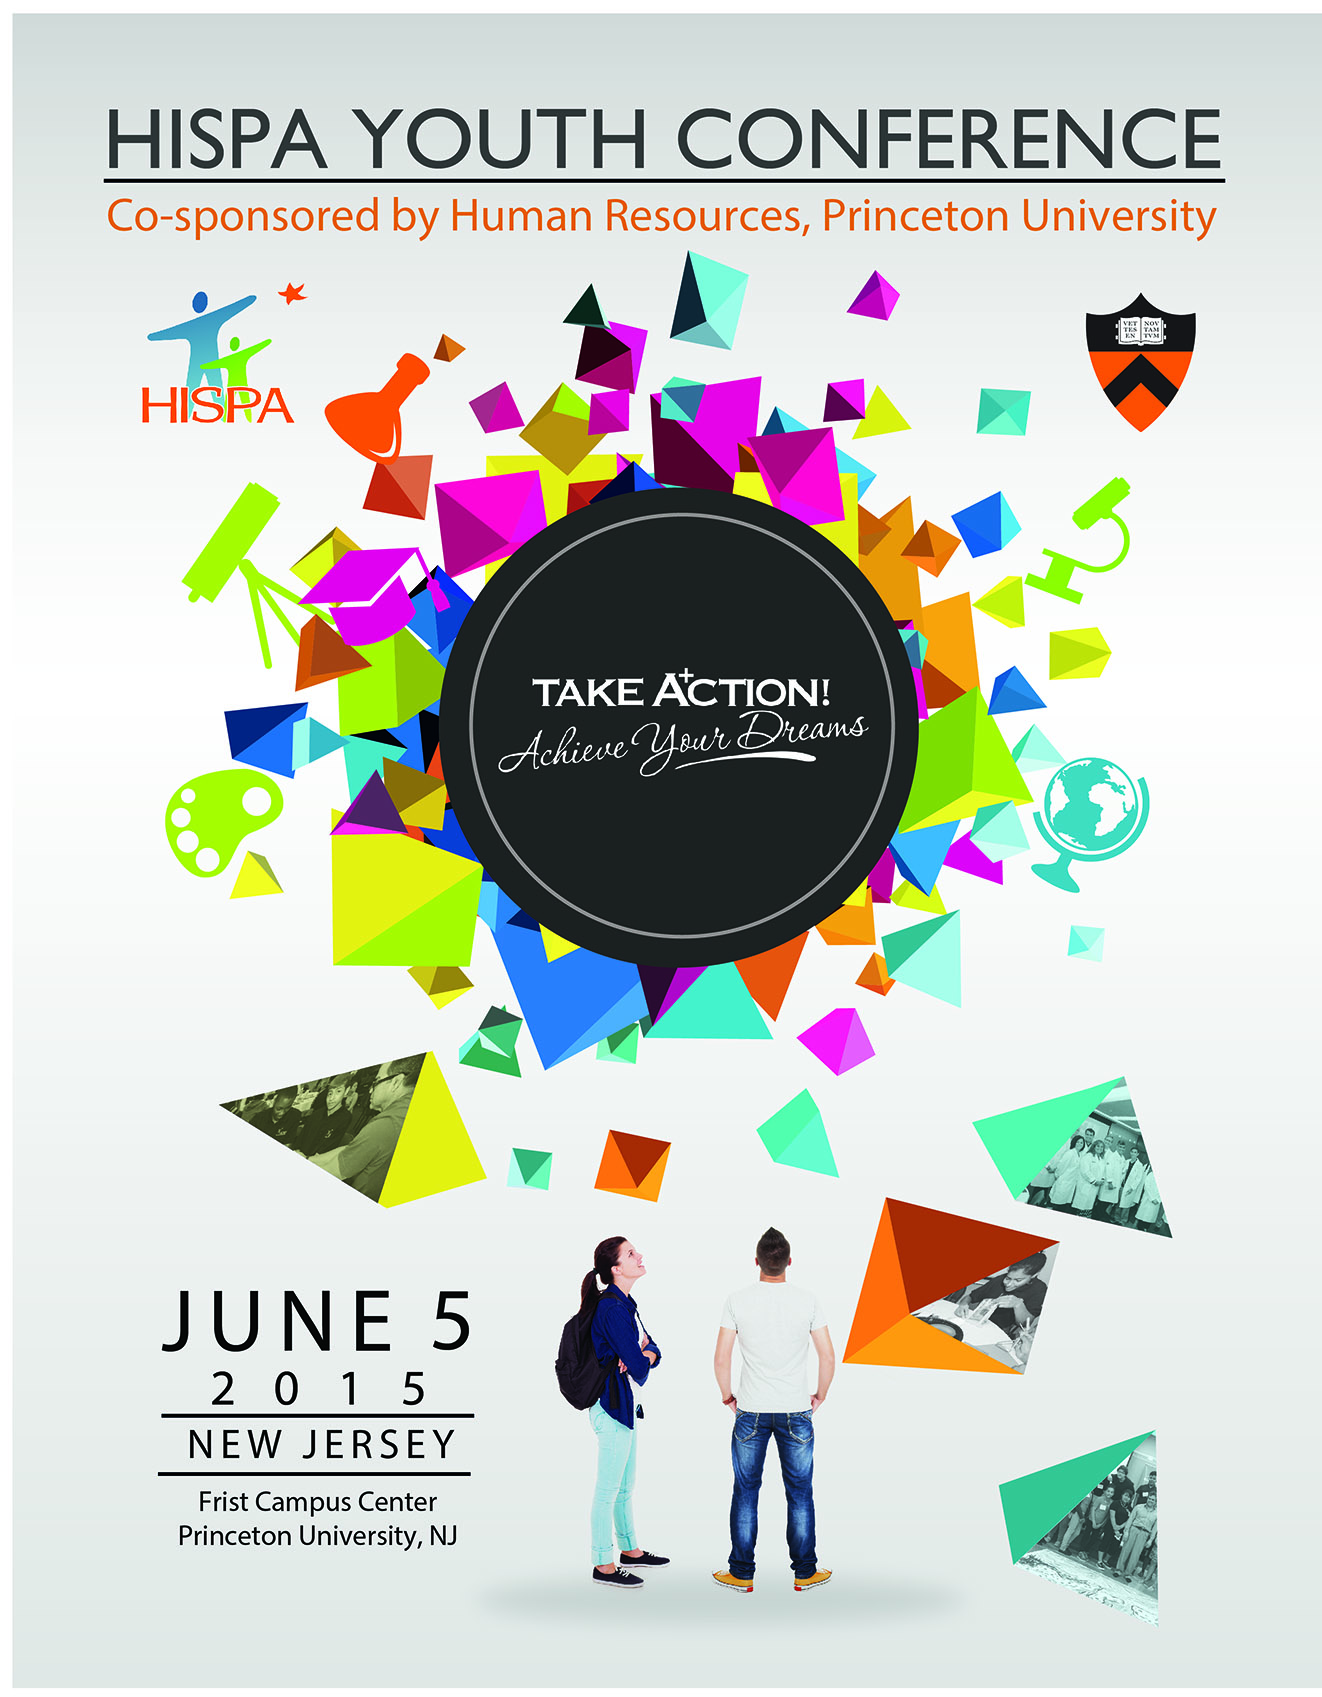 New Jersey, June 7th HISPA 2013 Youth Conference at Princeton University